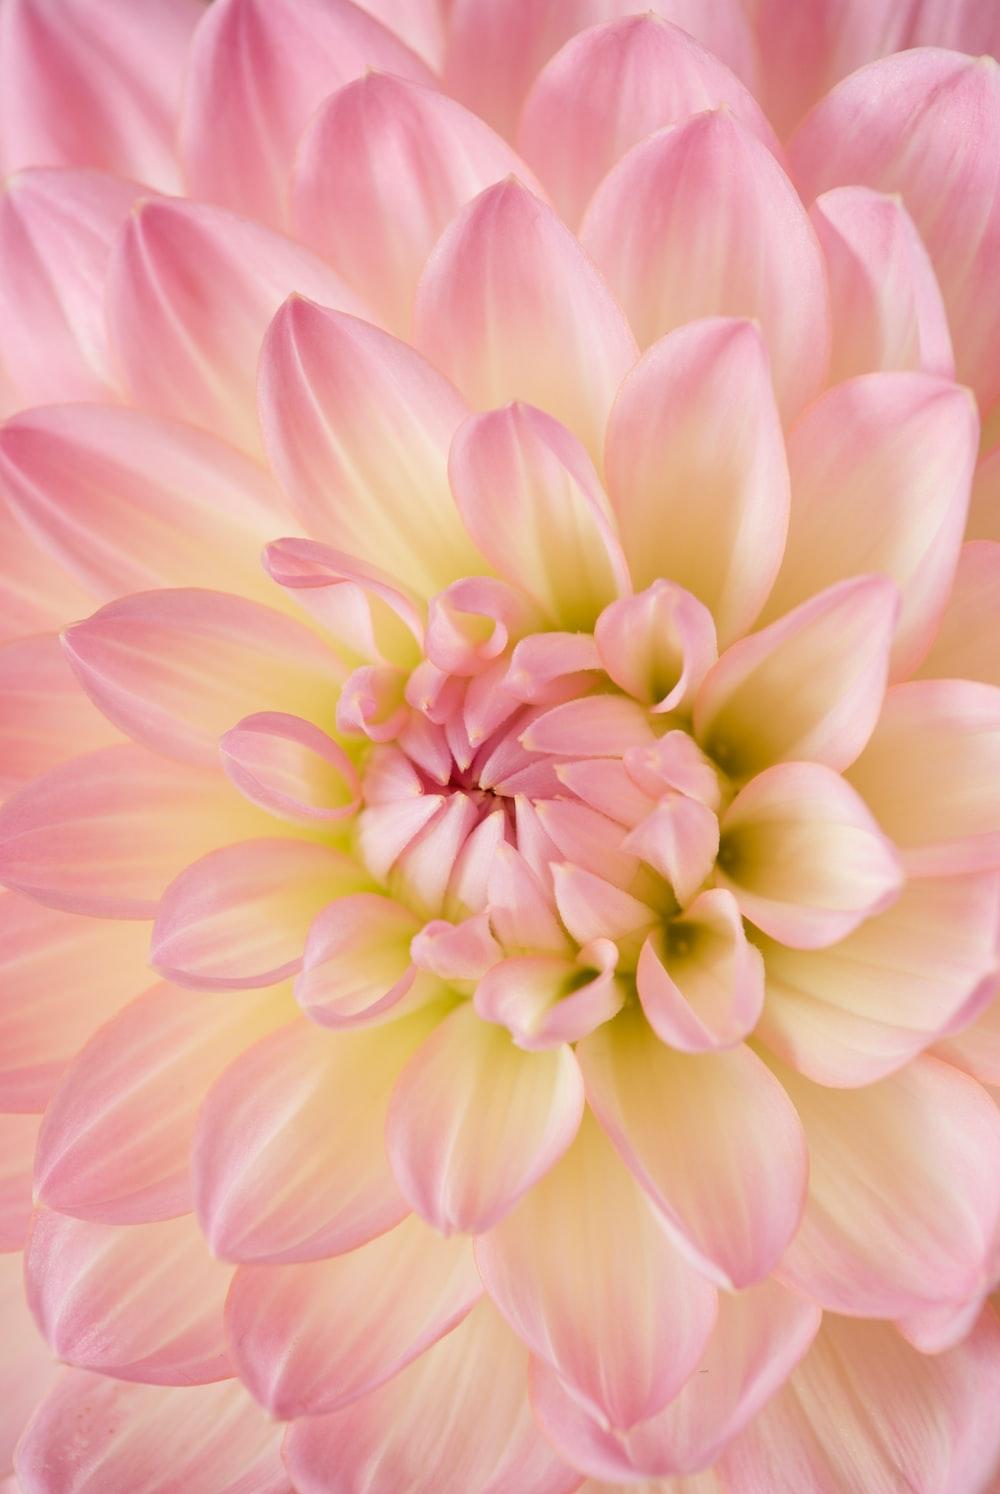 pink dahlia in bloom